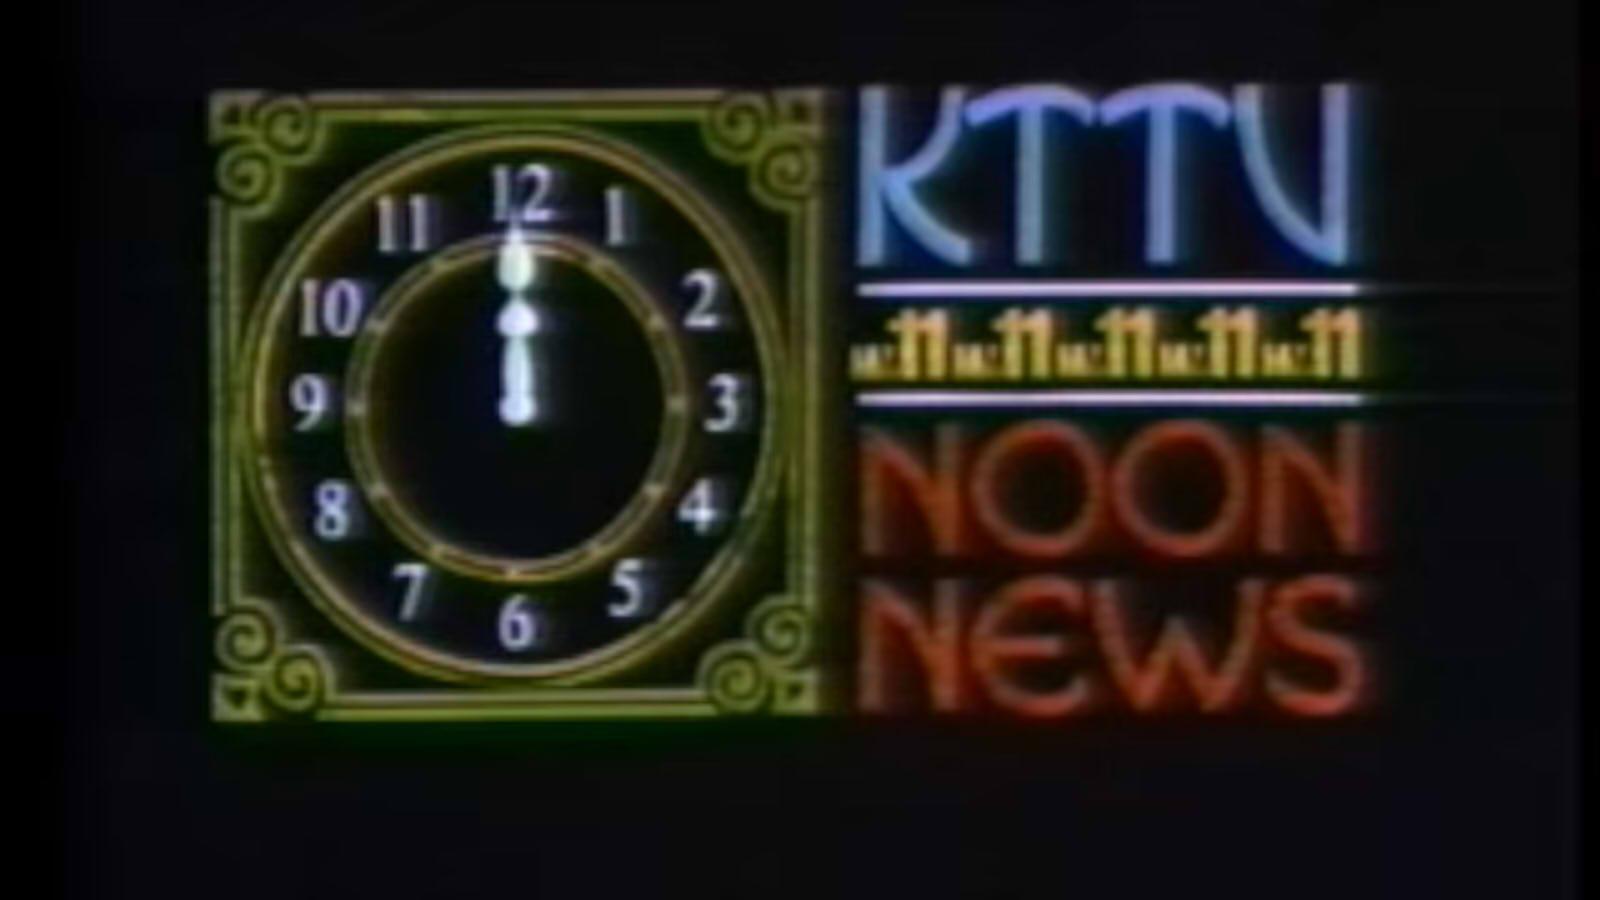 KTTV/News